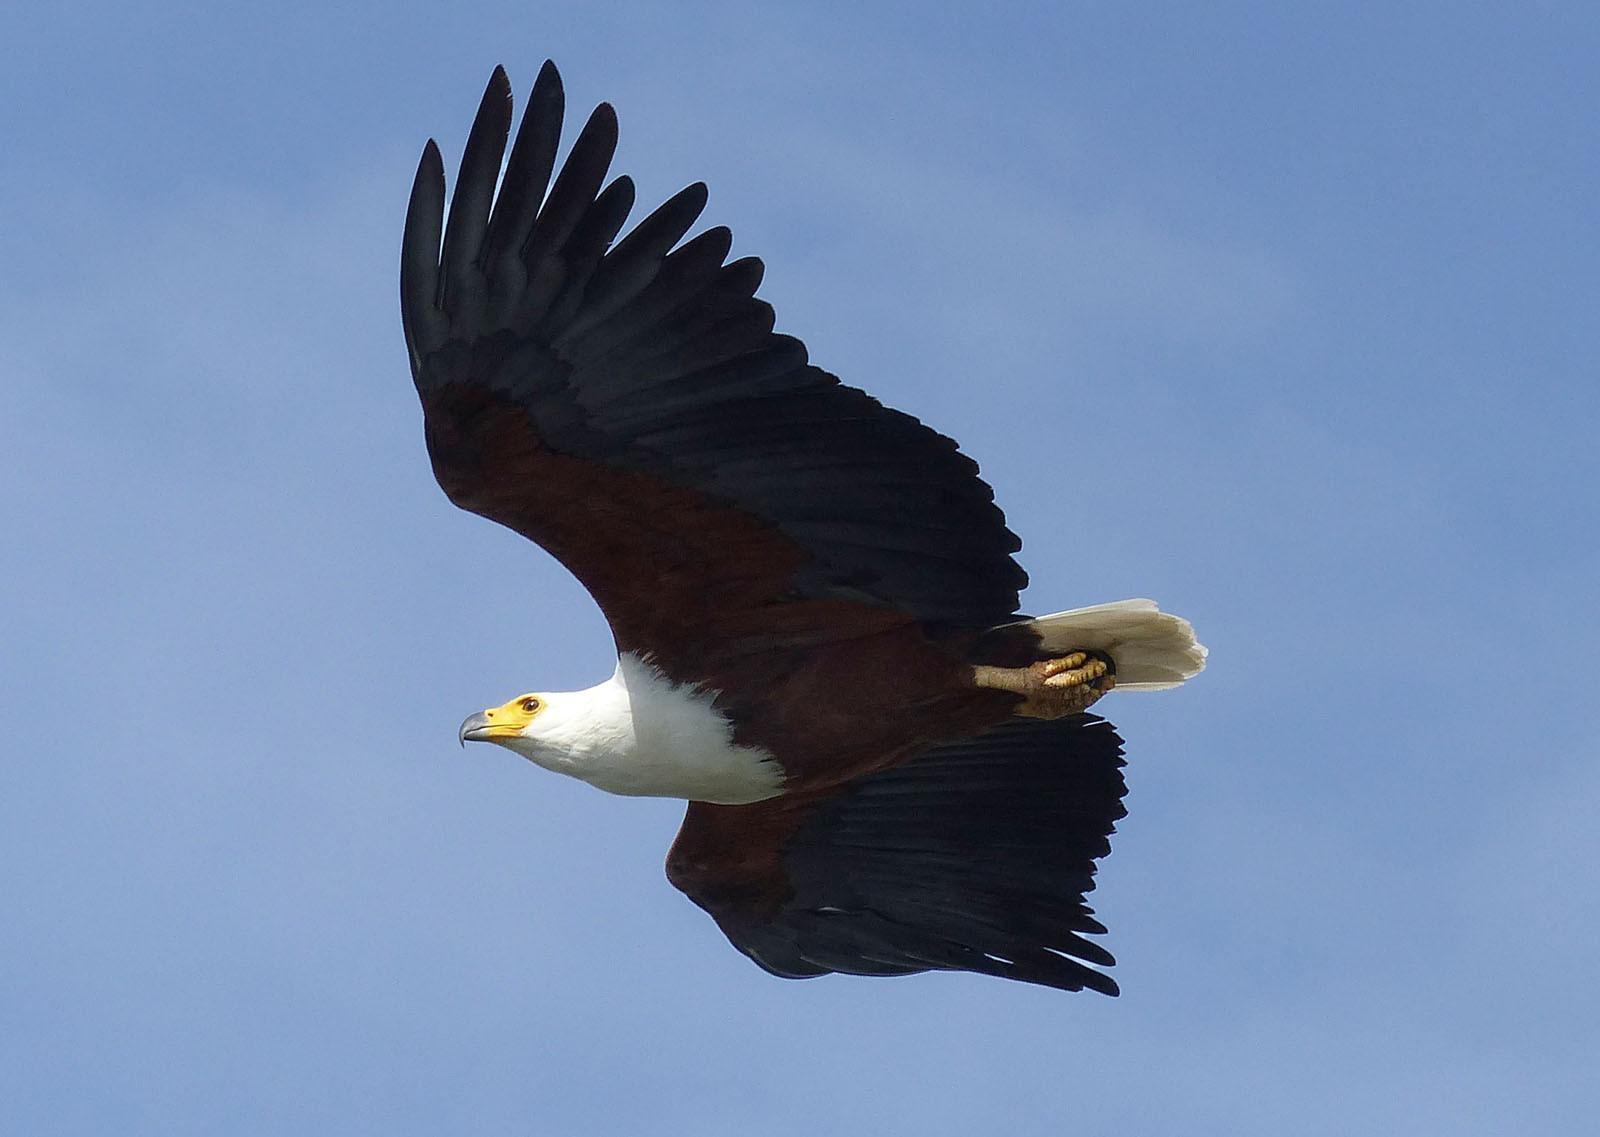 PDI - Fly Like An Eagle - Steve Miller Band by Alison Cowan (12 marks)